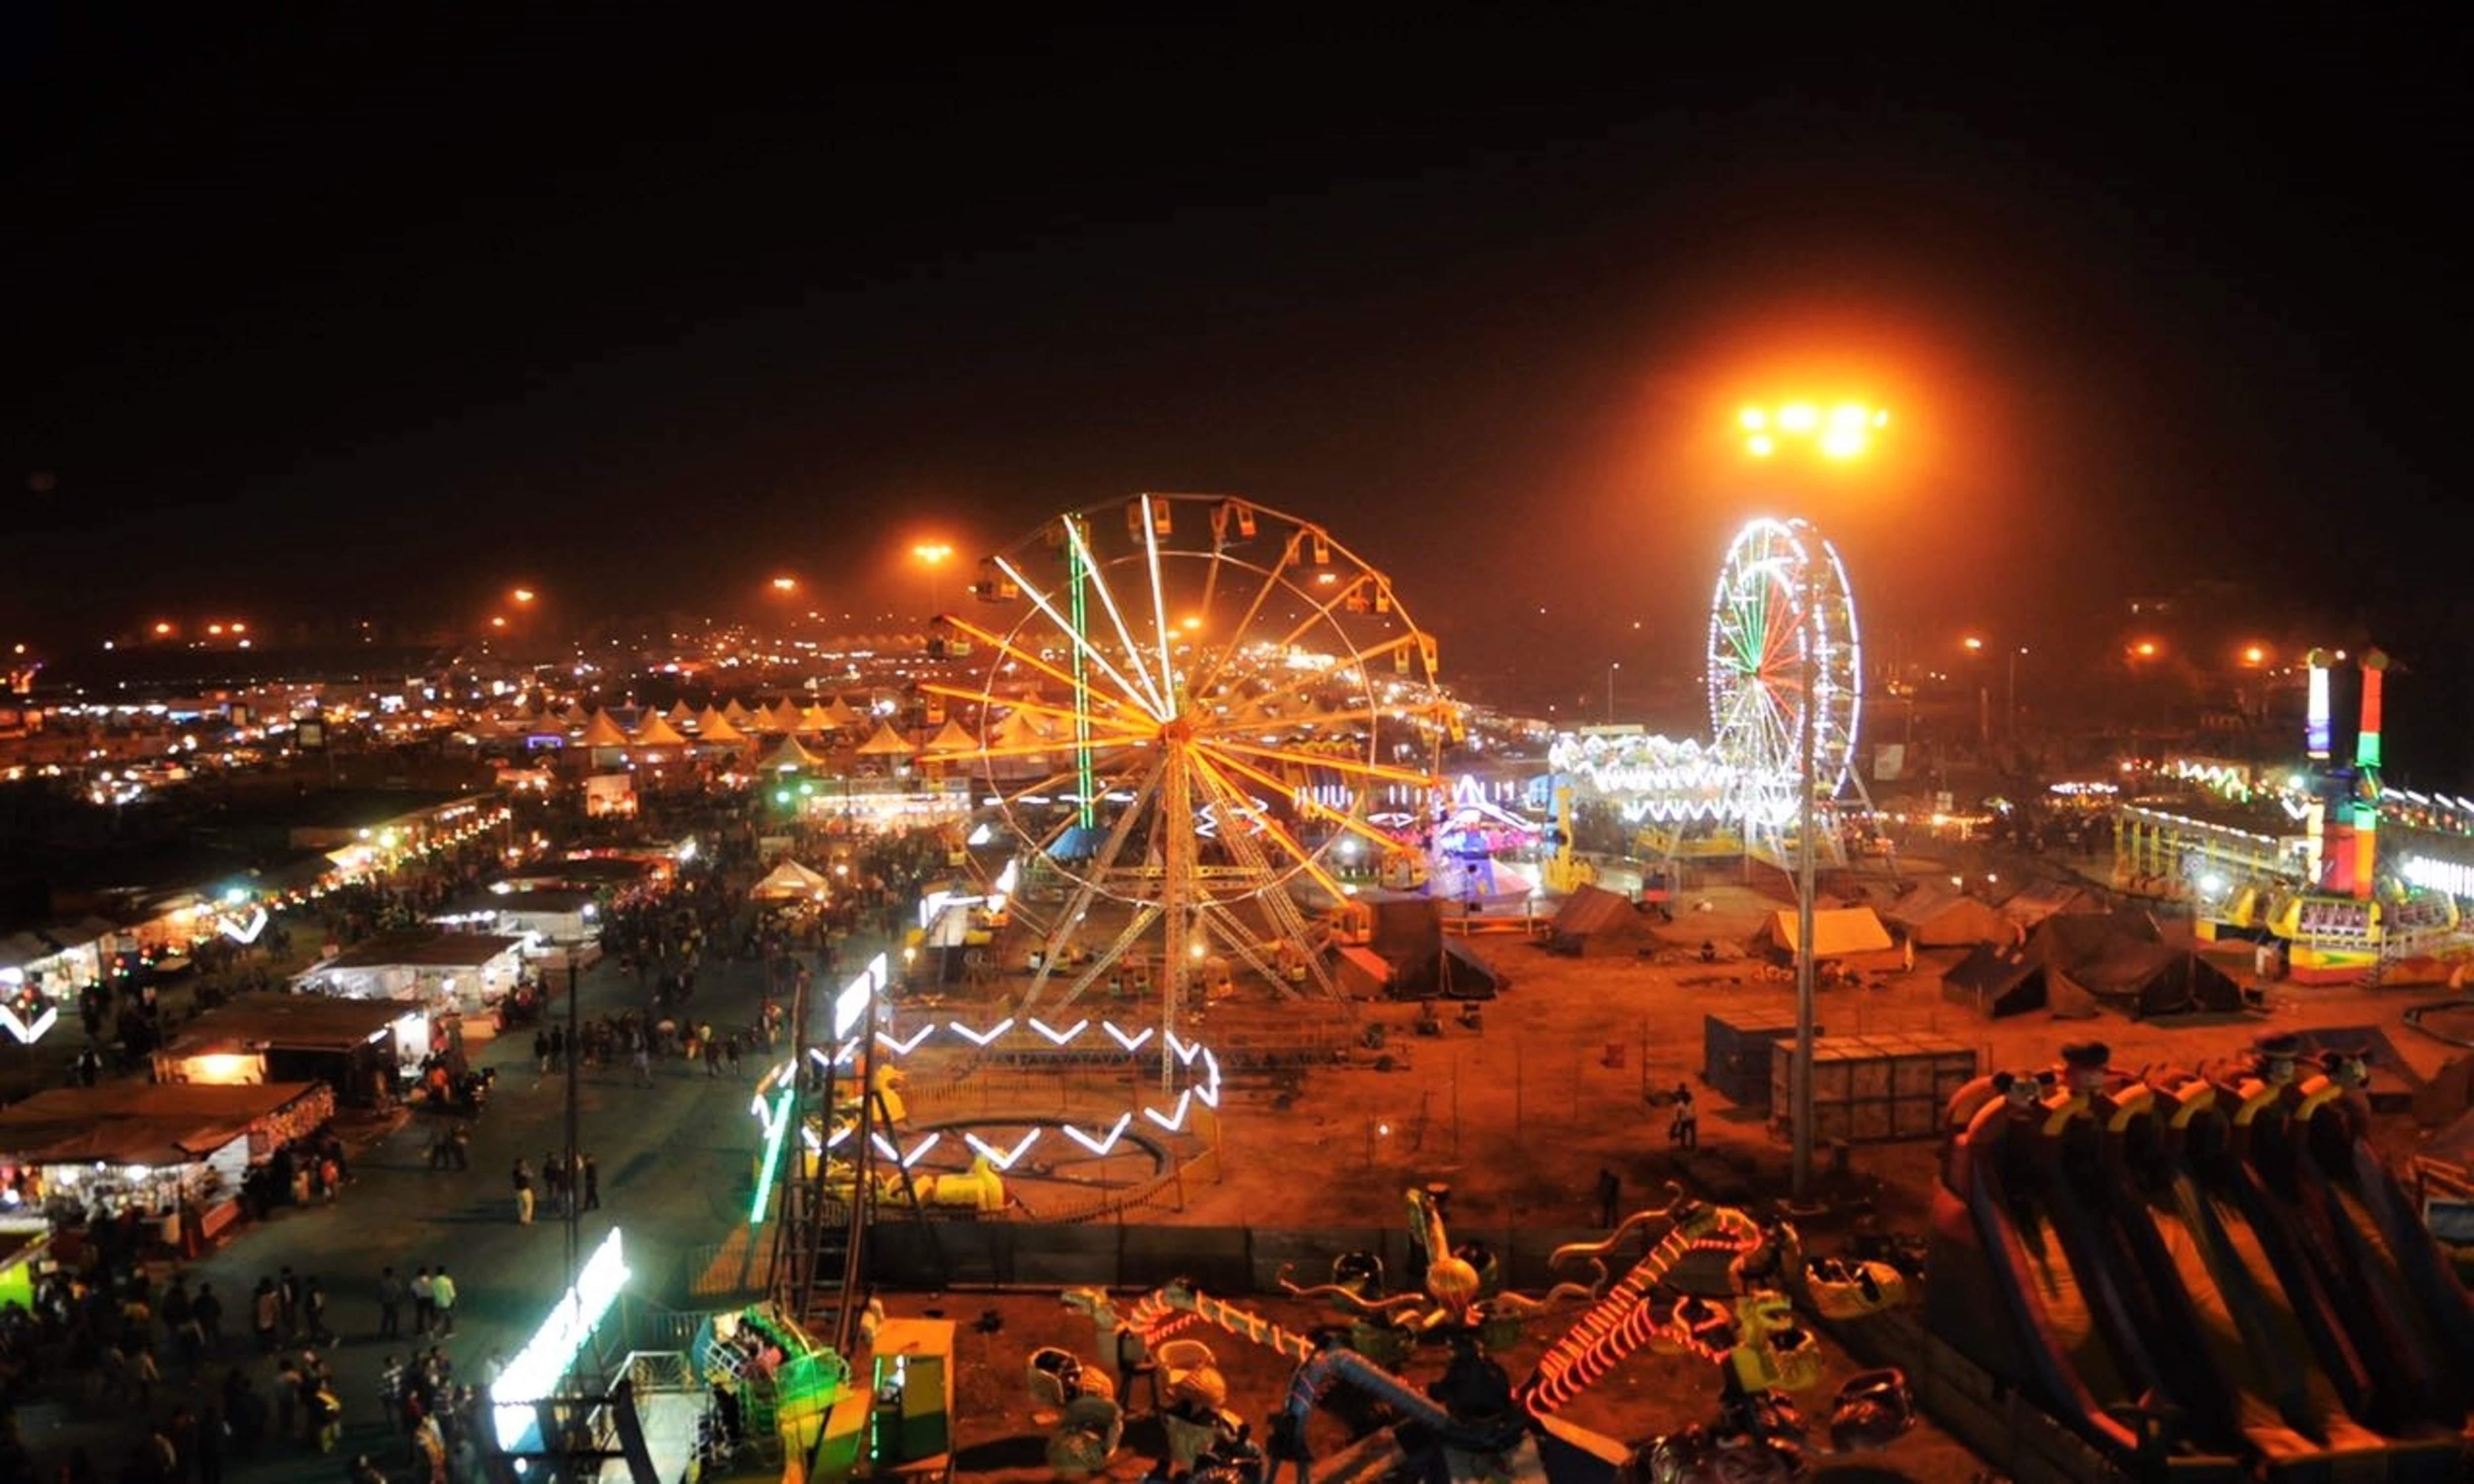 A Glimpse of Lucknow Mahotsava (www.lucknowmahotsav.in)